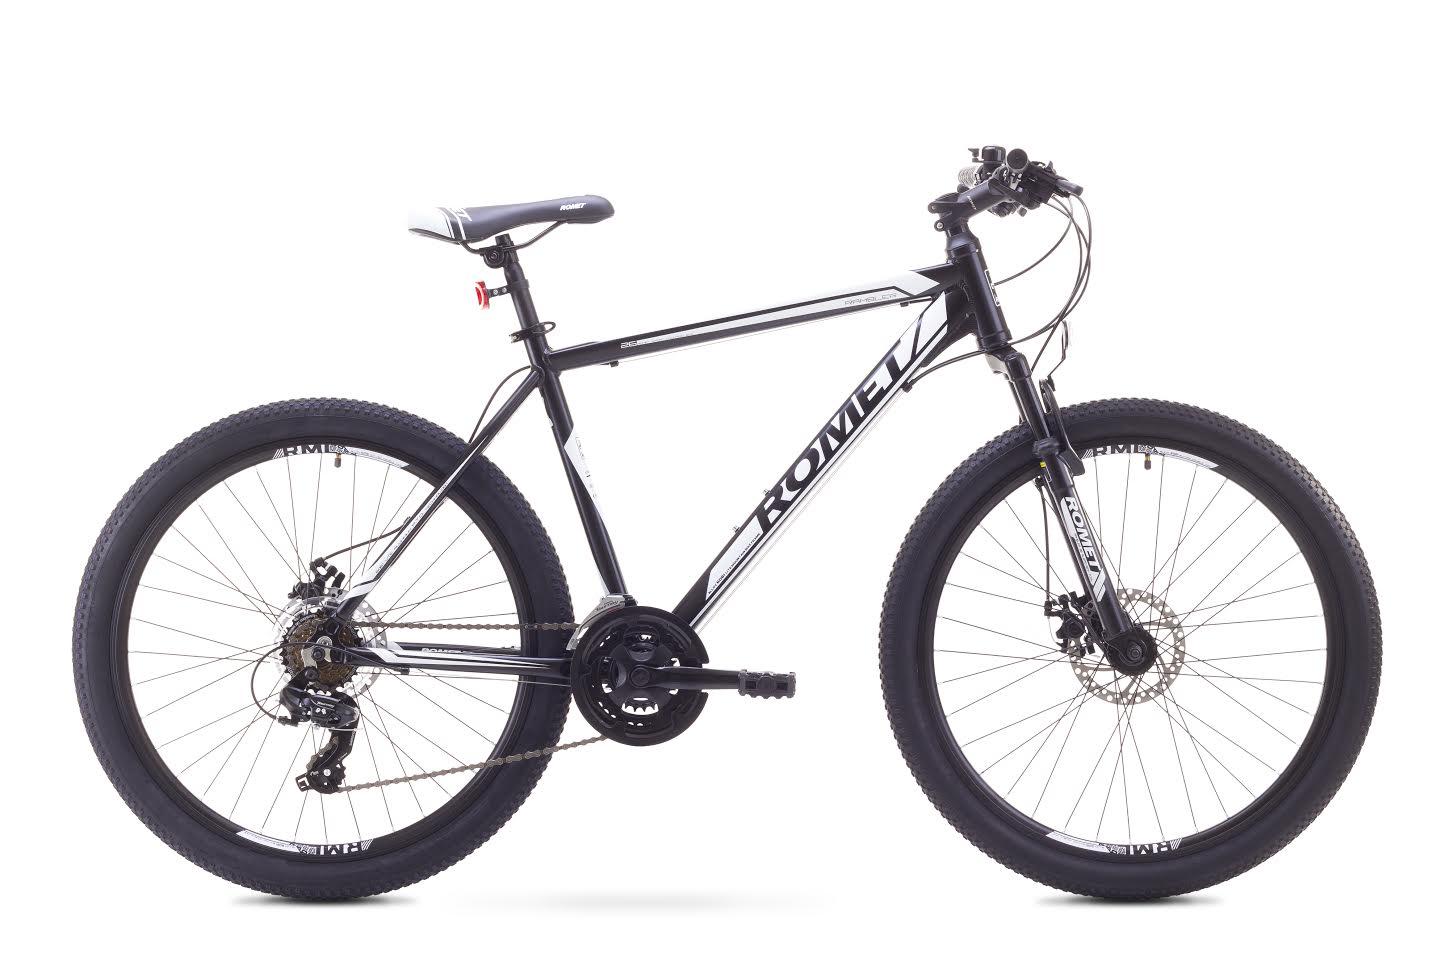 ROMET RAMBLER 26 2 MTB 19-L R26 MELNS/BALTS kalnu velosipēds MTB